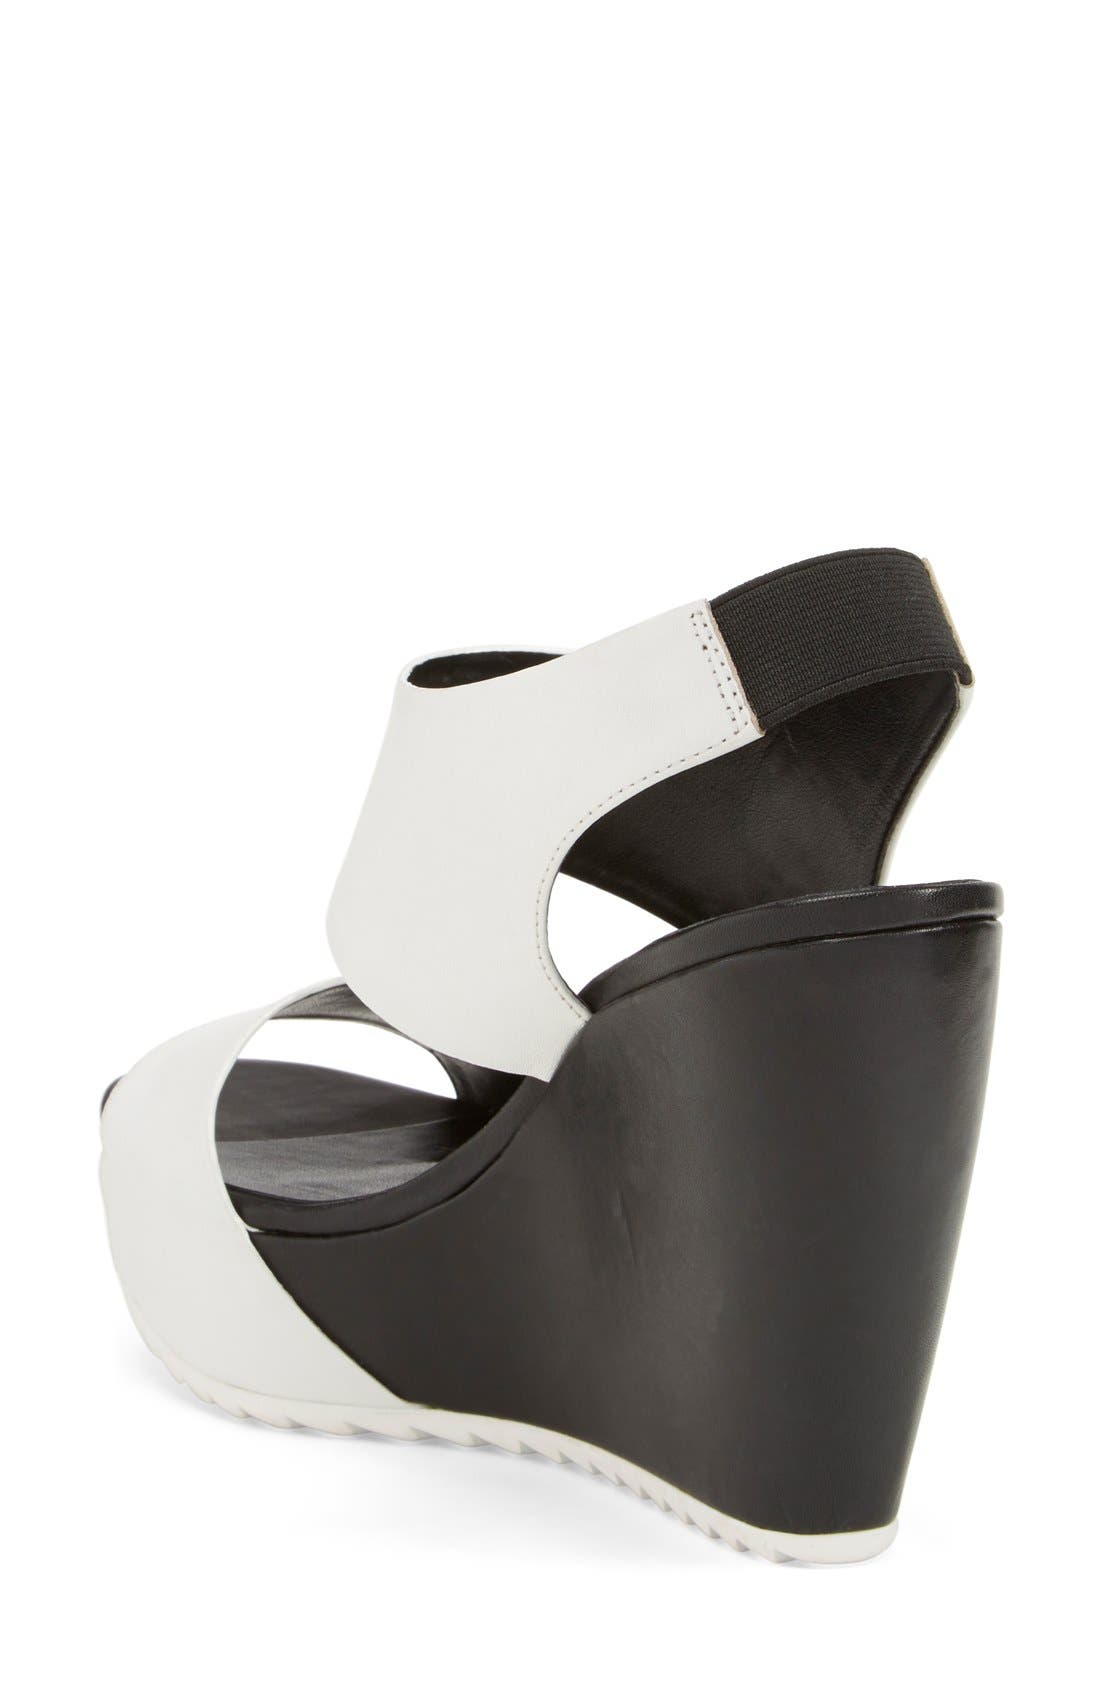 Alternate Image 2  - Trouvé 'Morgan' Platform Wedge Leather Sandal (Women)